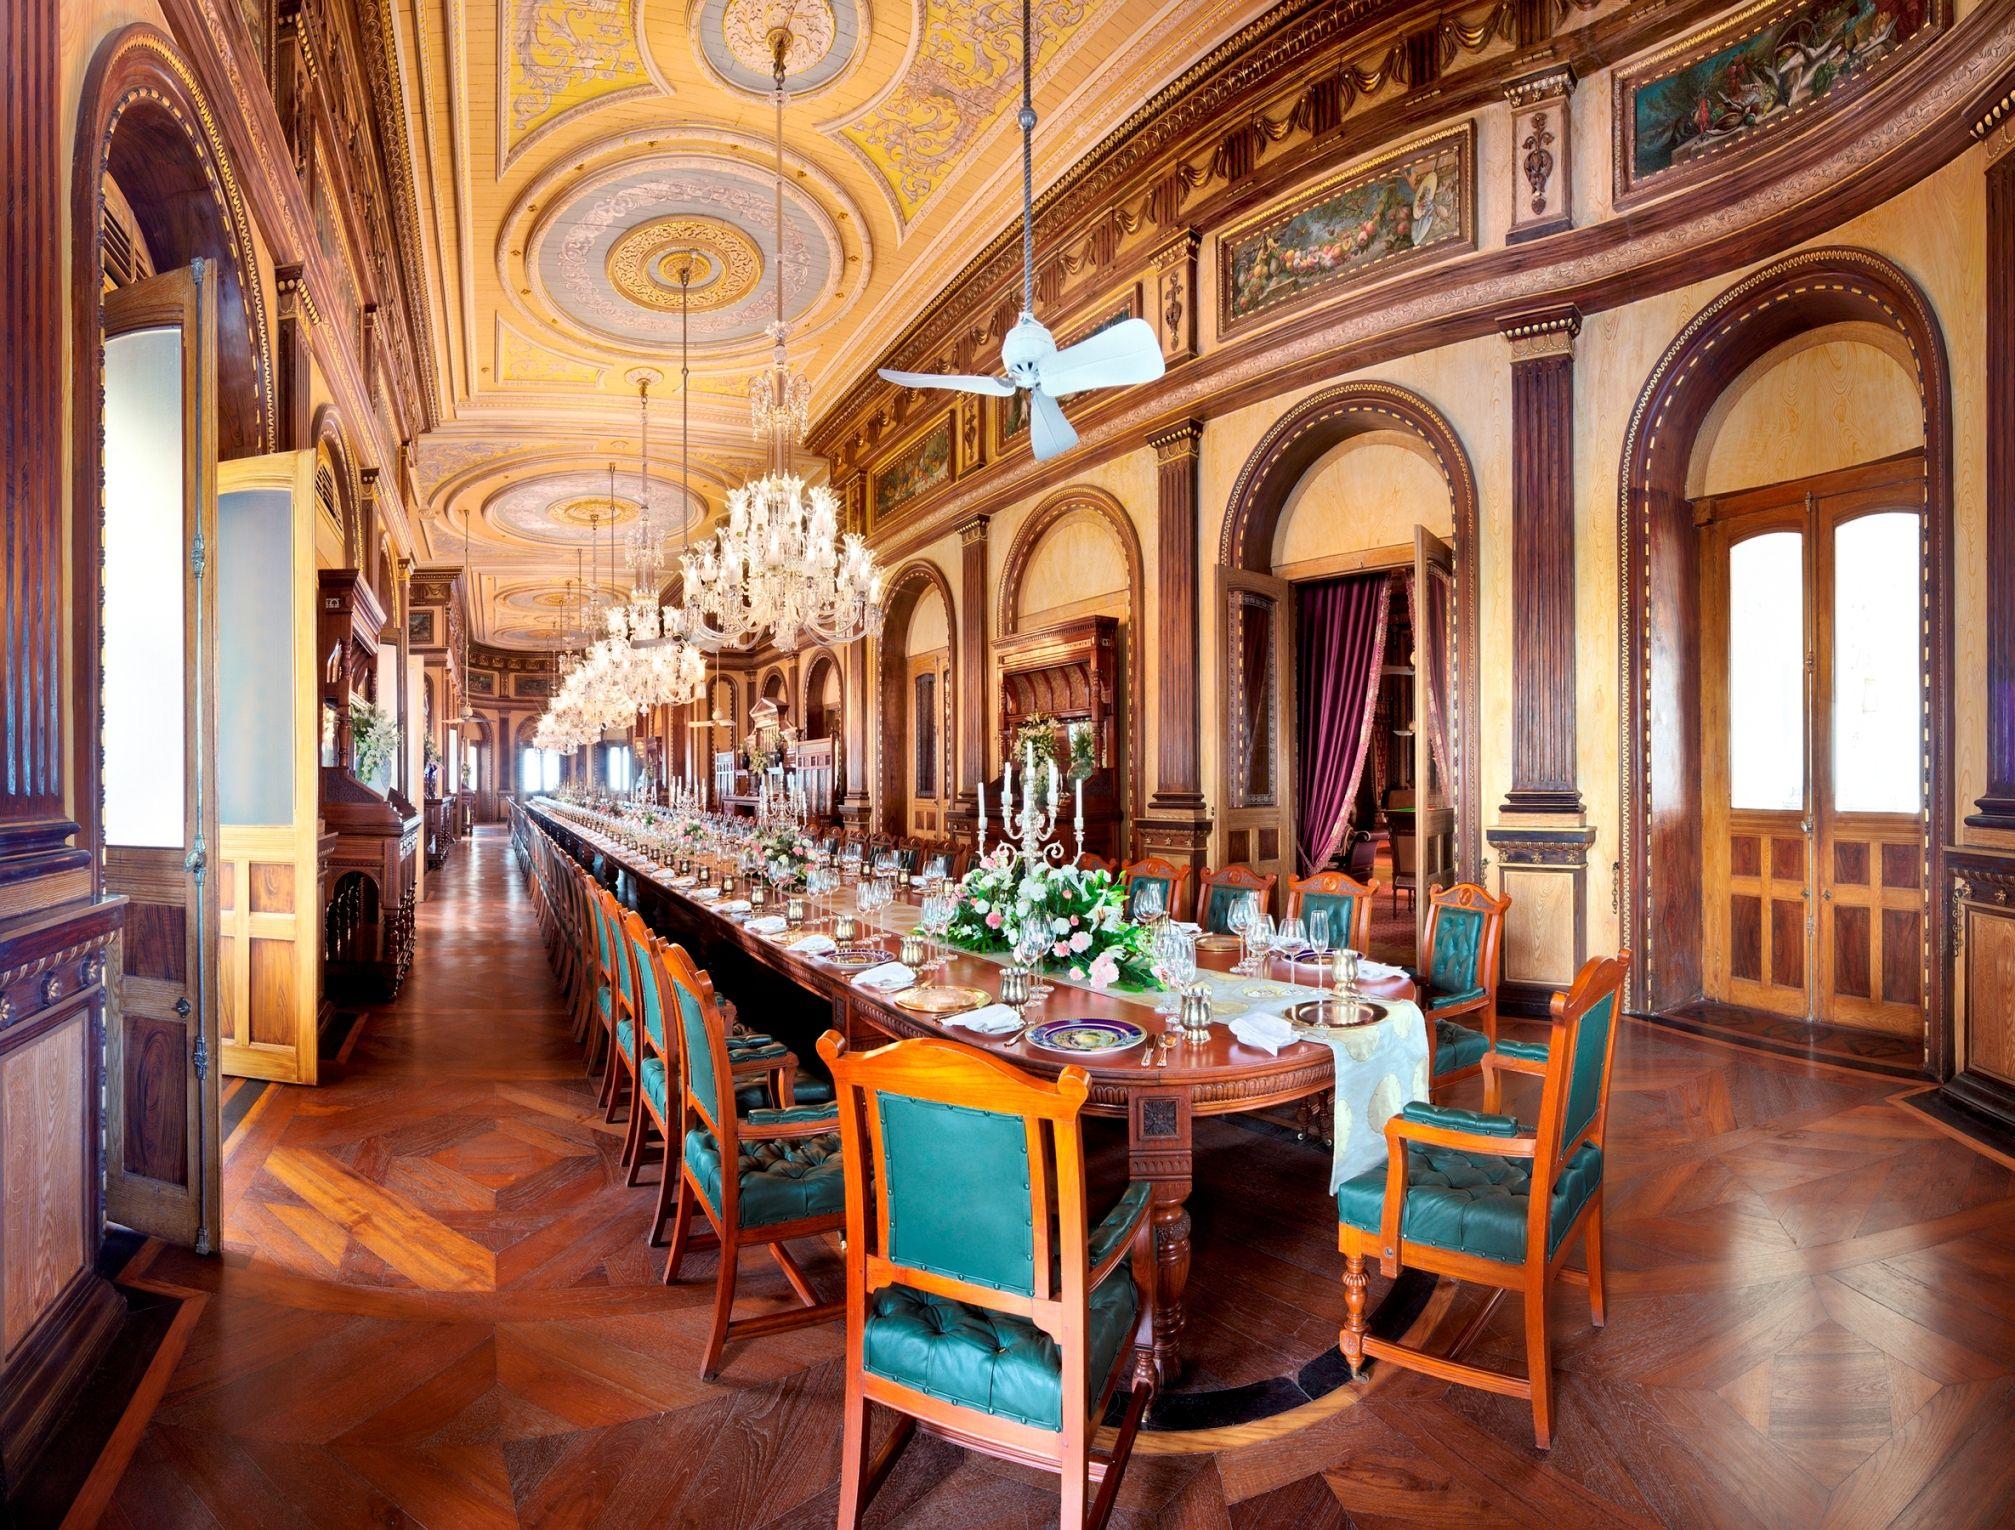 Dining Room At Taj Falaknuma Palace Hyderabad South India